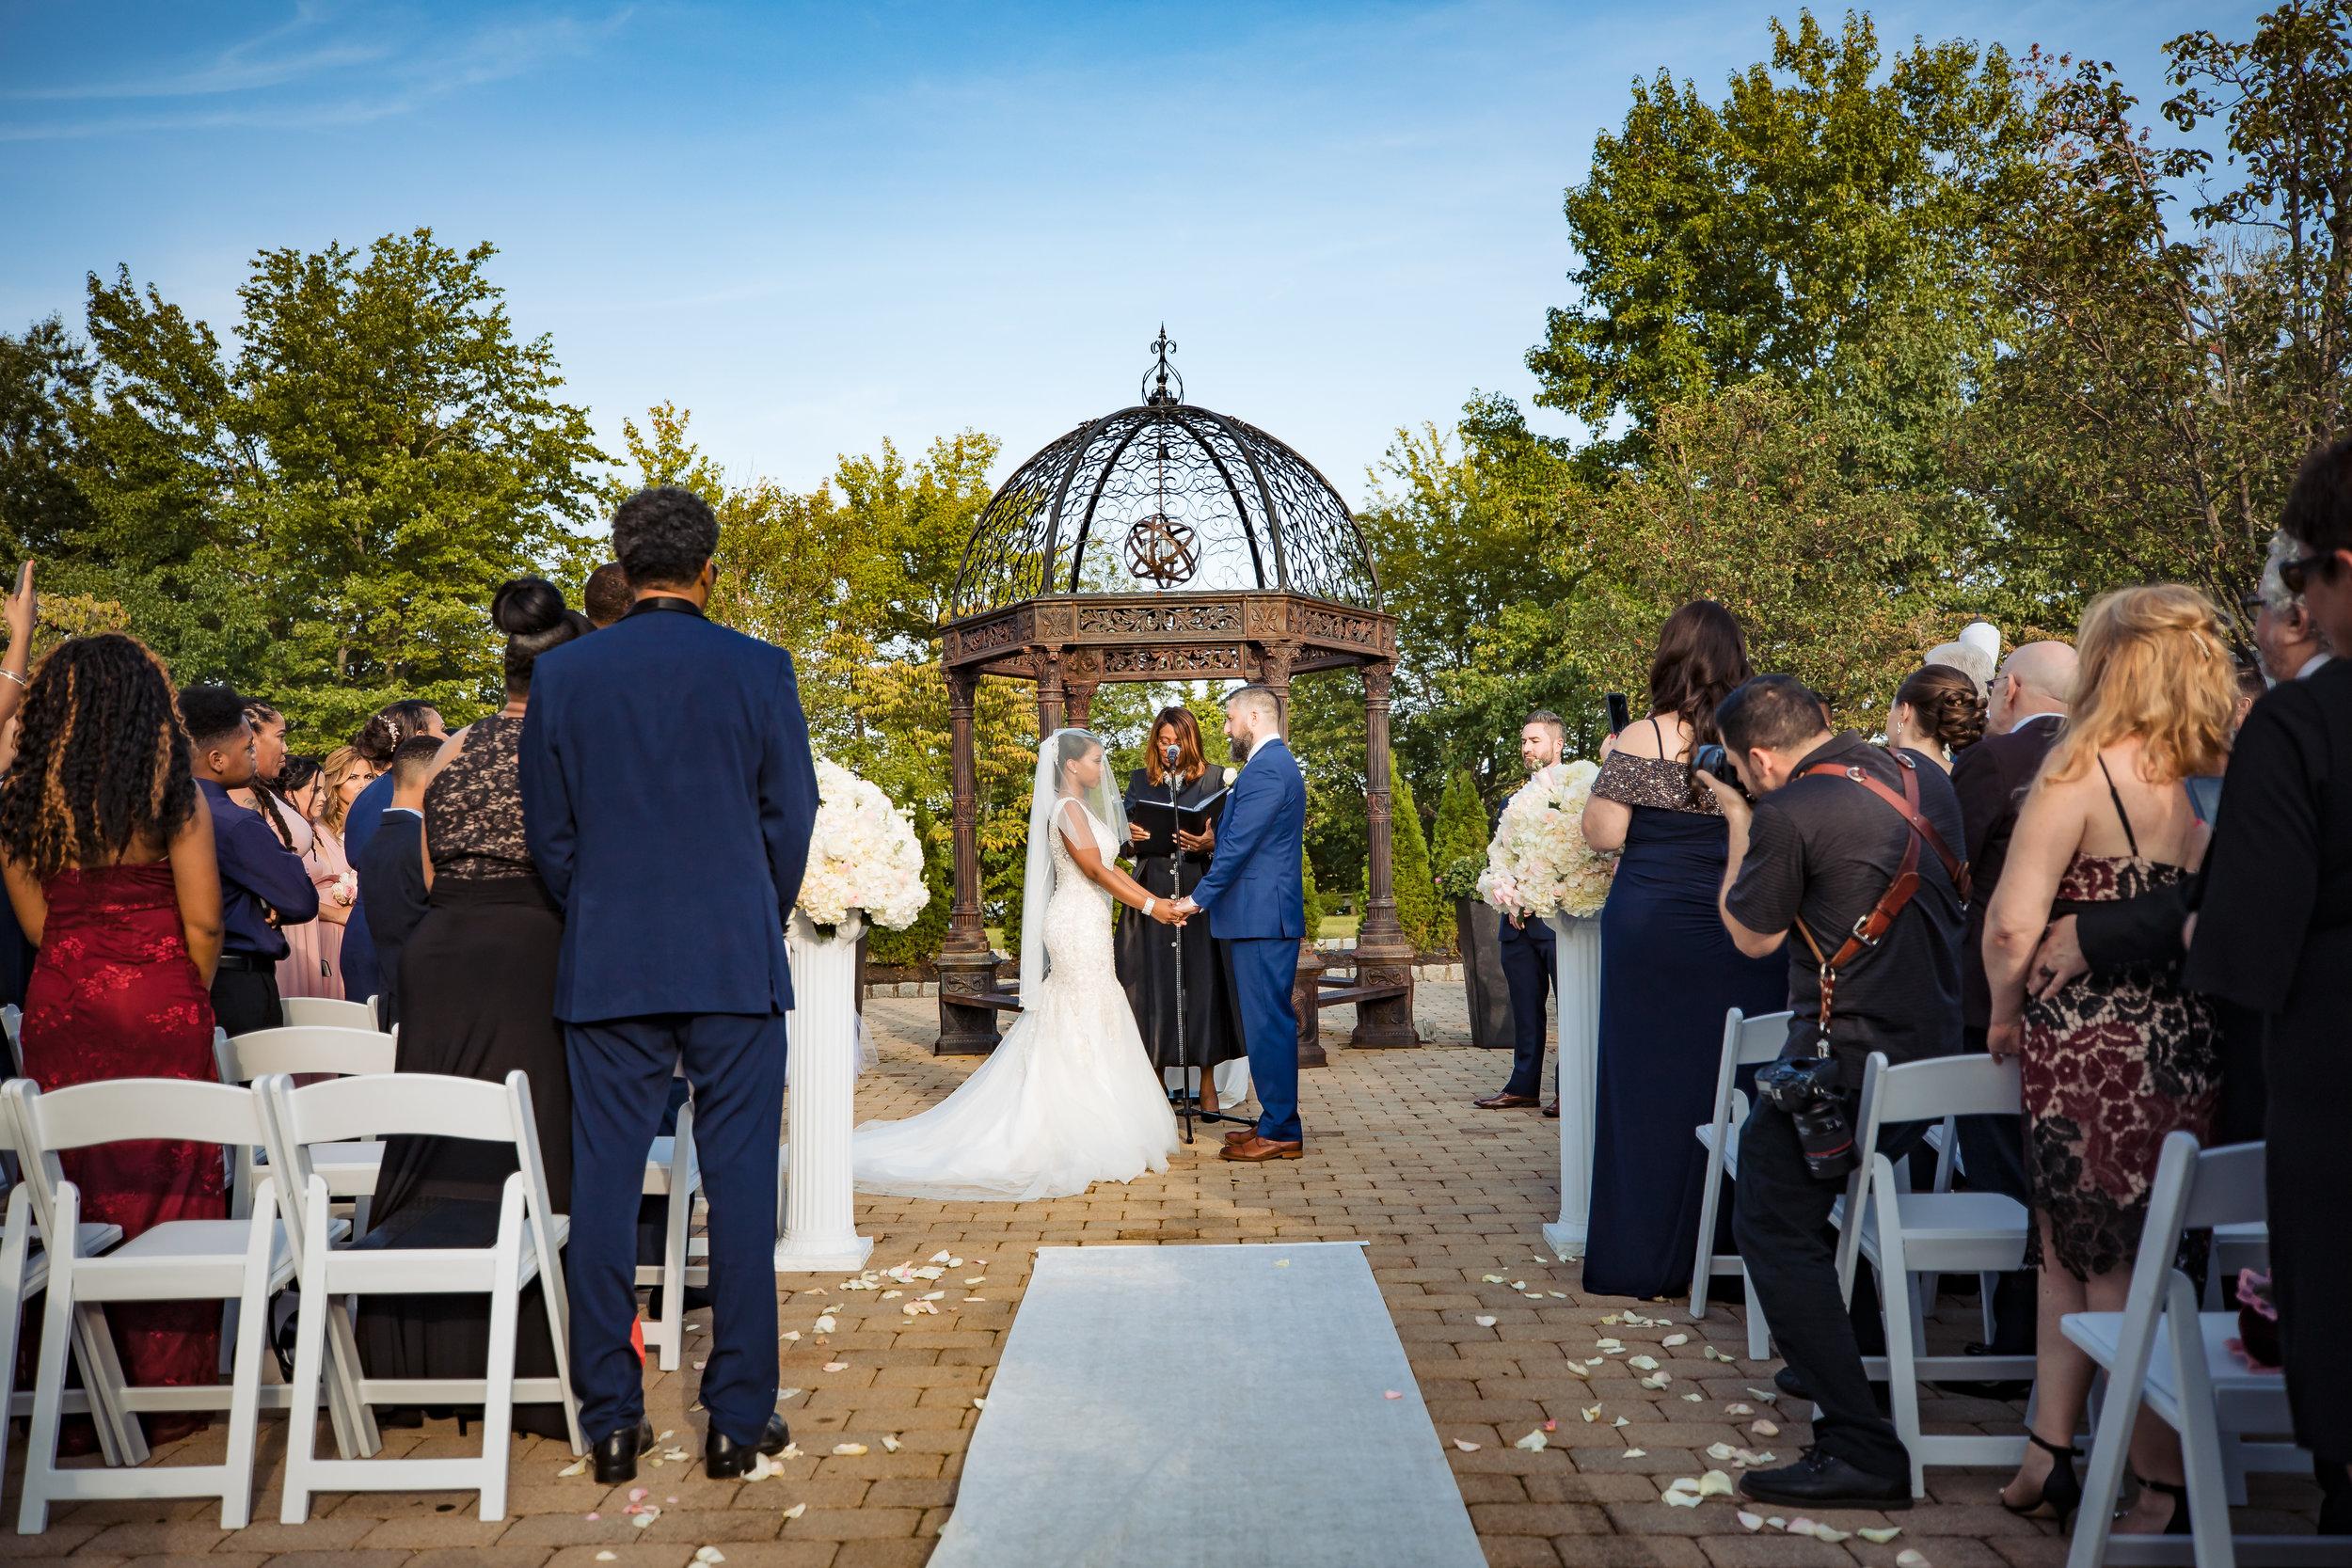 Best NJ wedding photographer Daniel Nydick